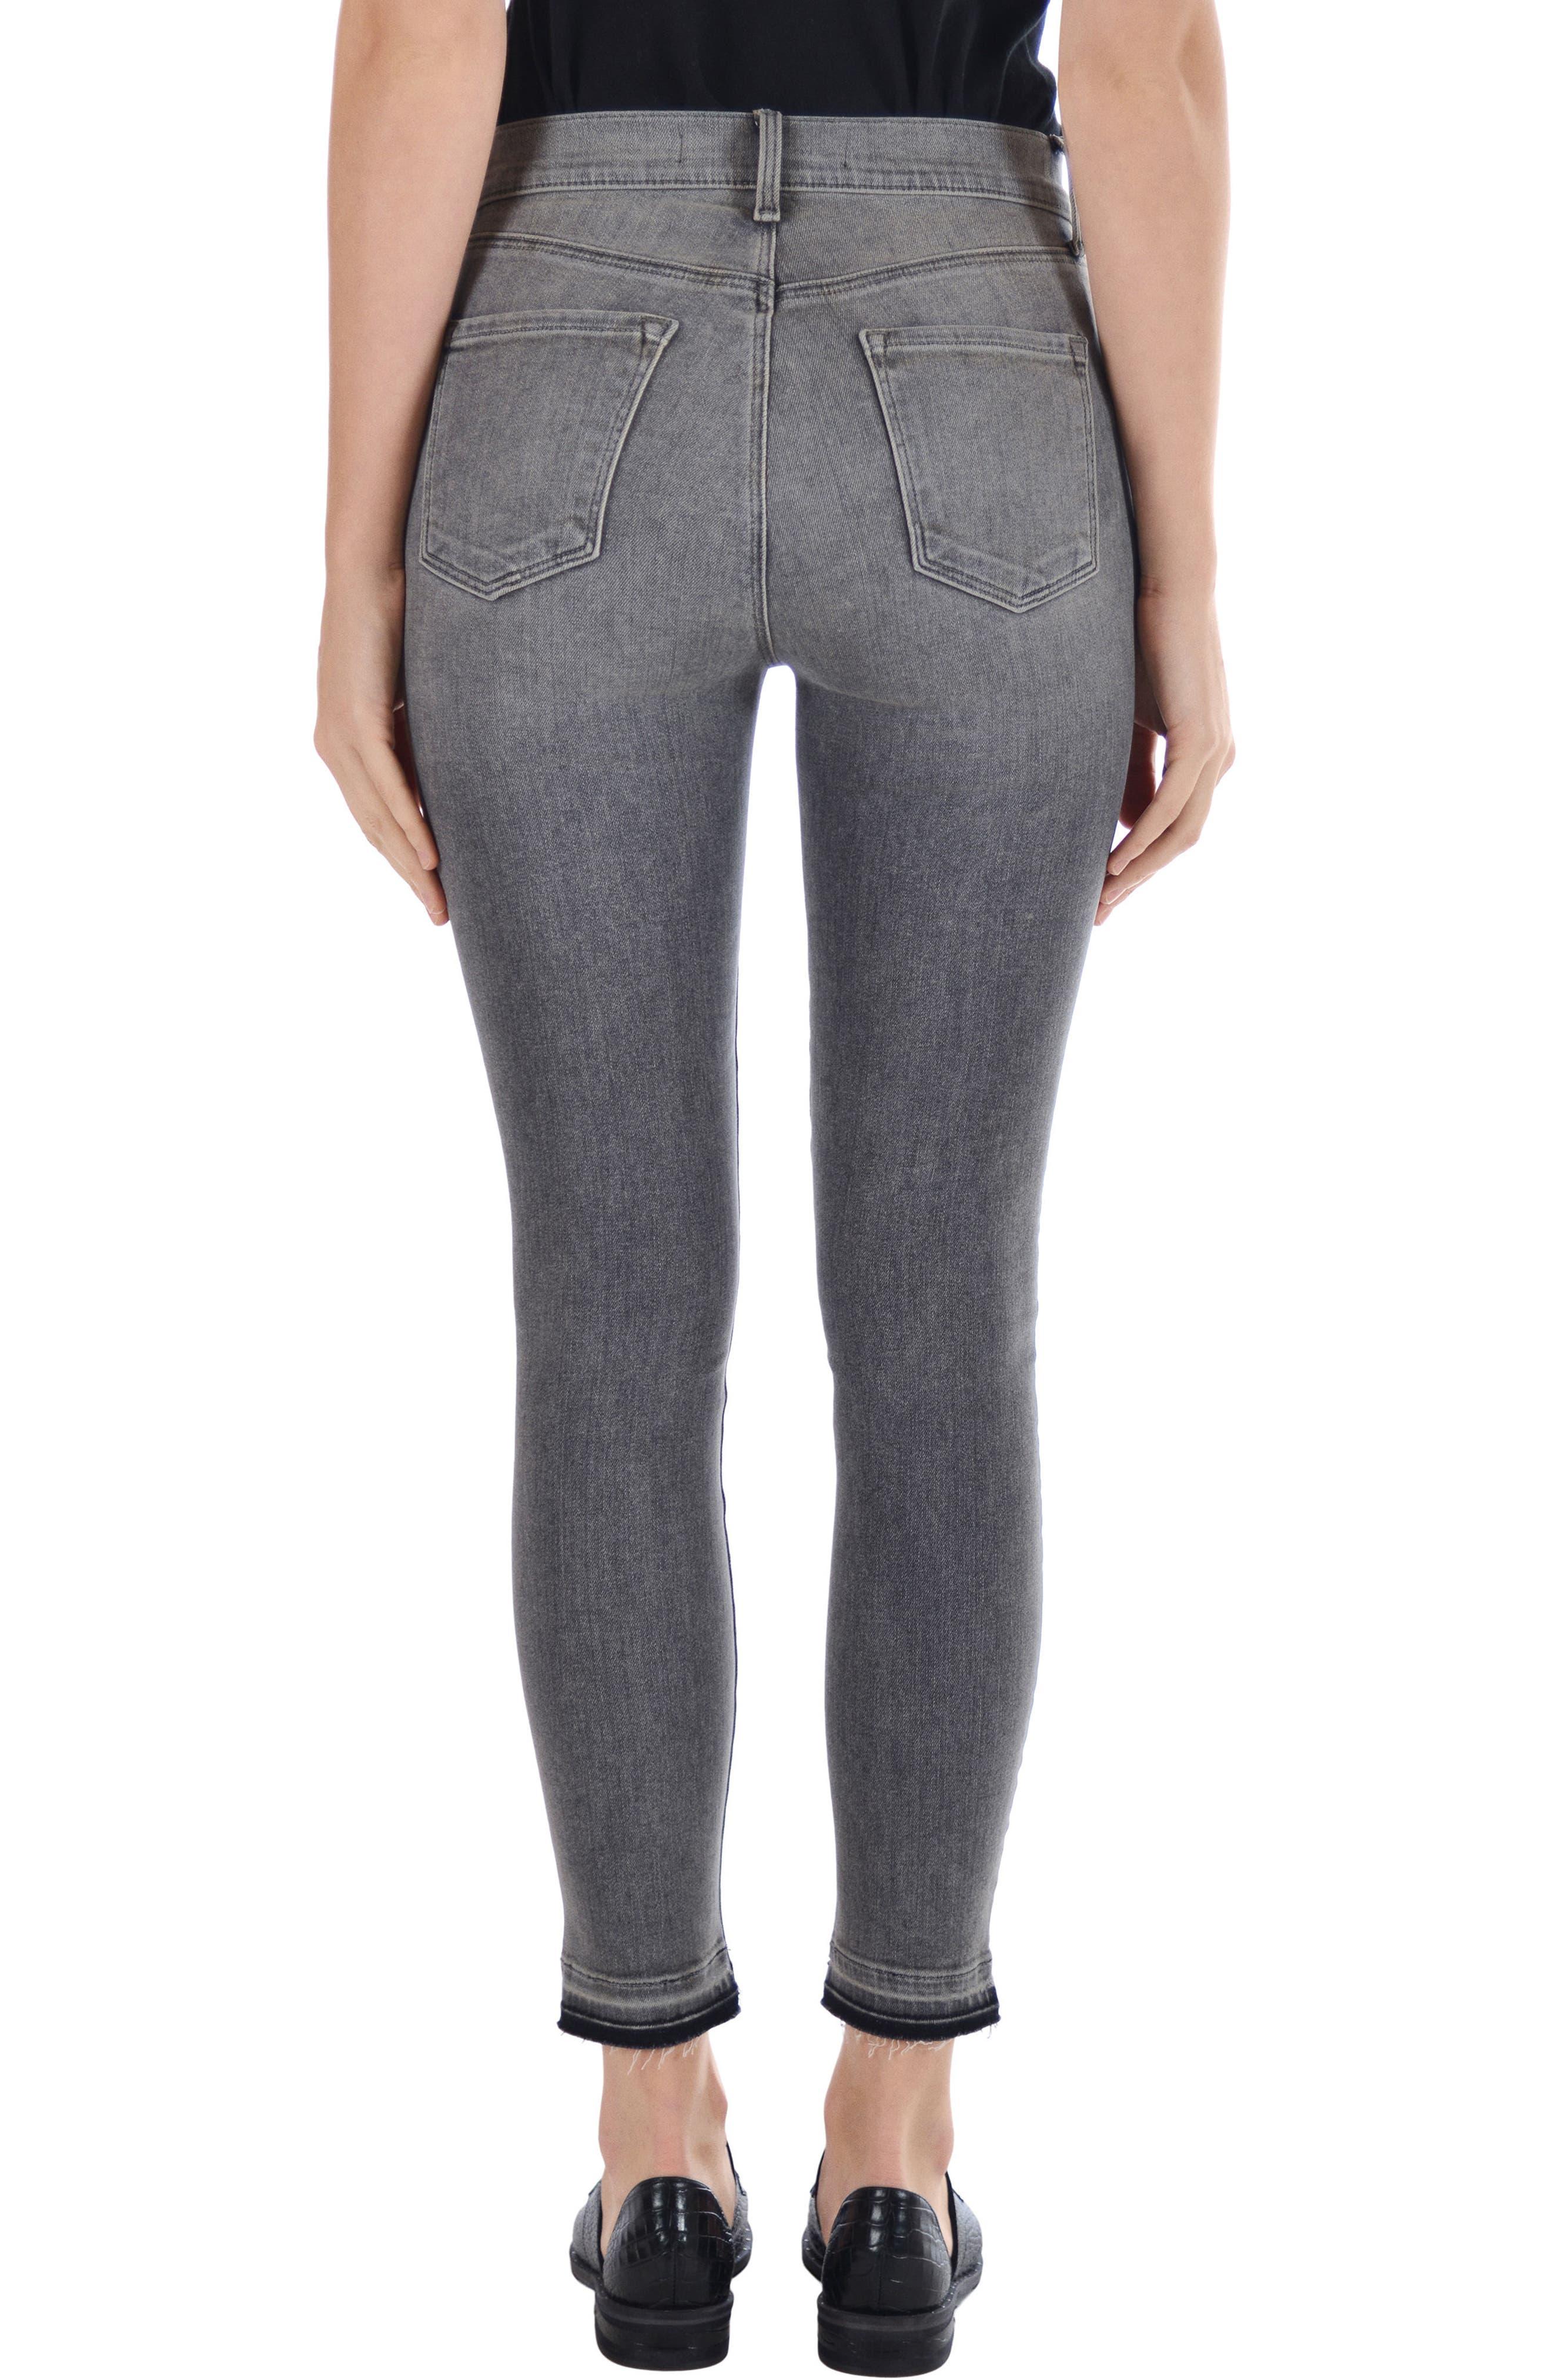 Alana High Waist Ankle Skinny Jeans,                             Alternate thumbnail 2, color,                             030